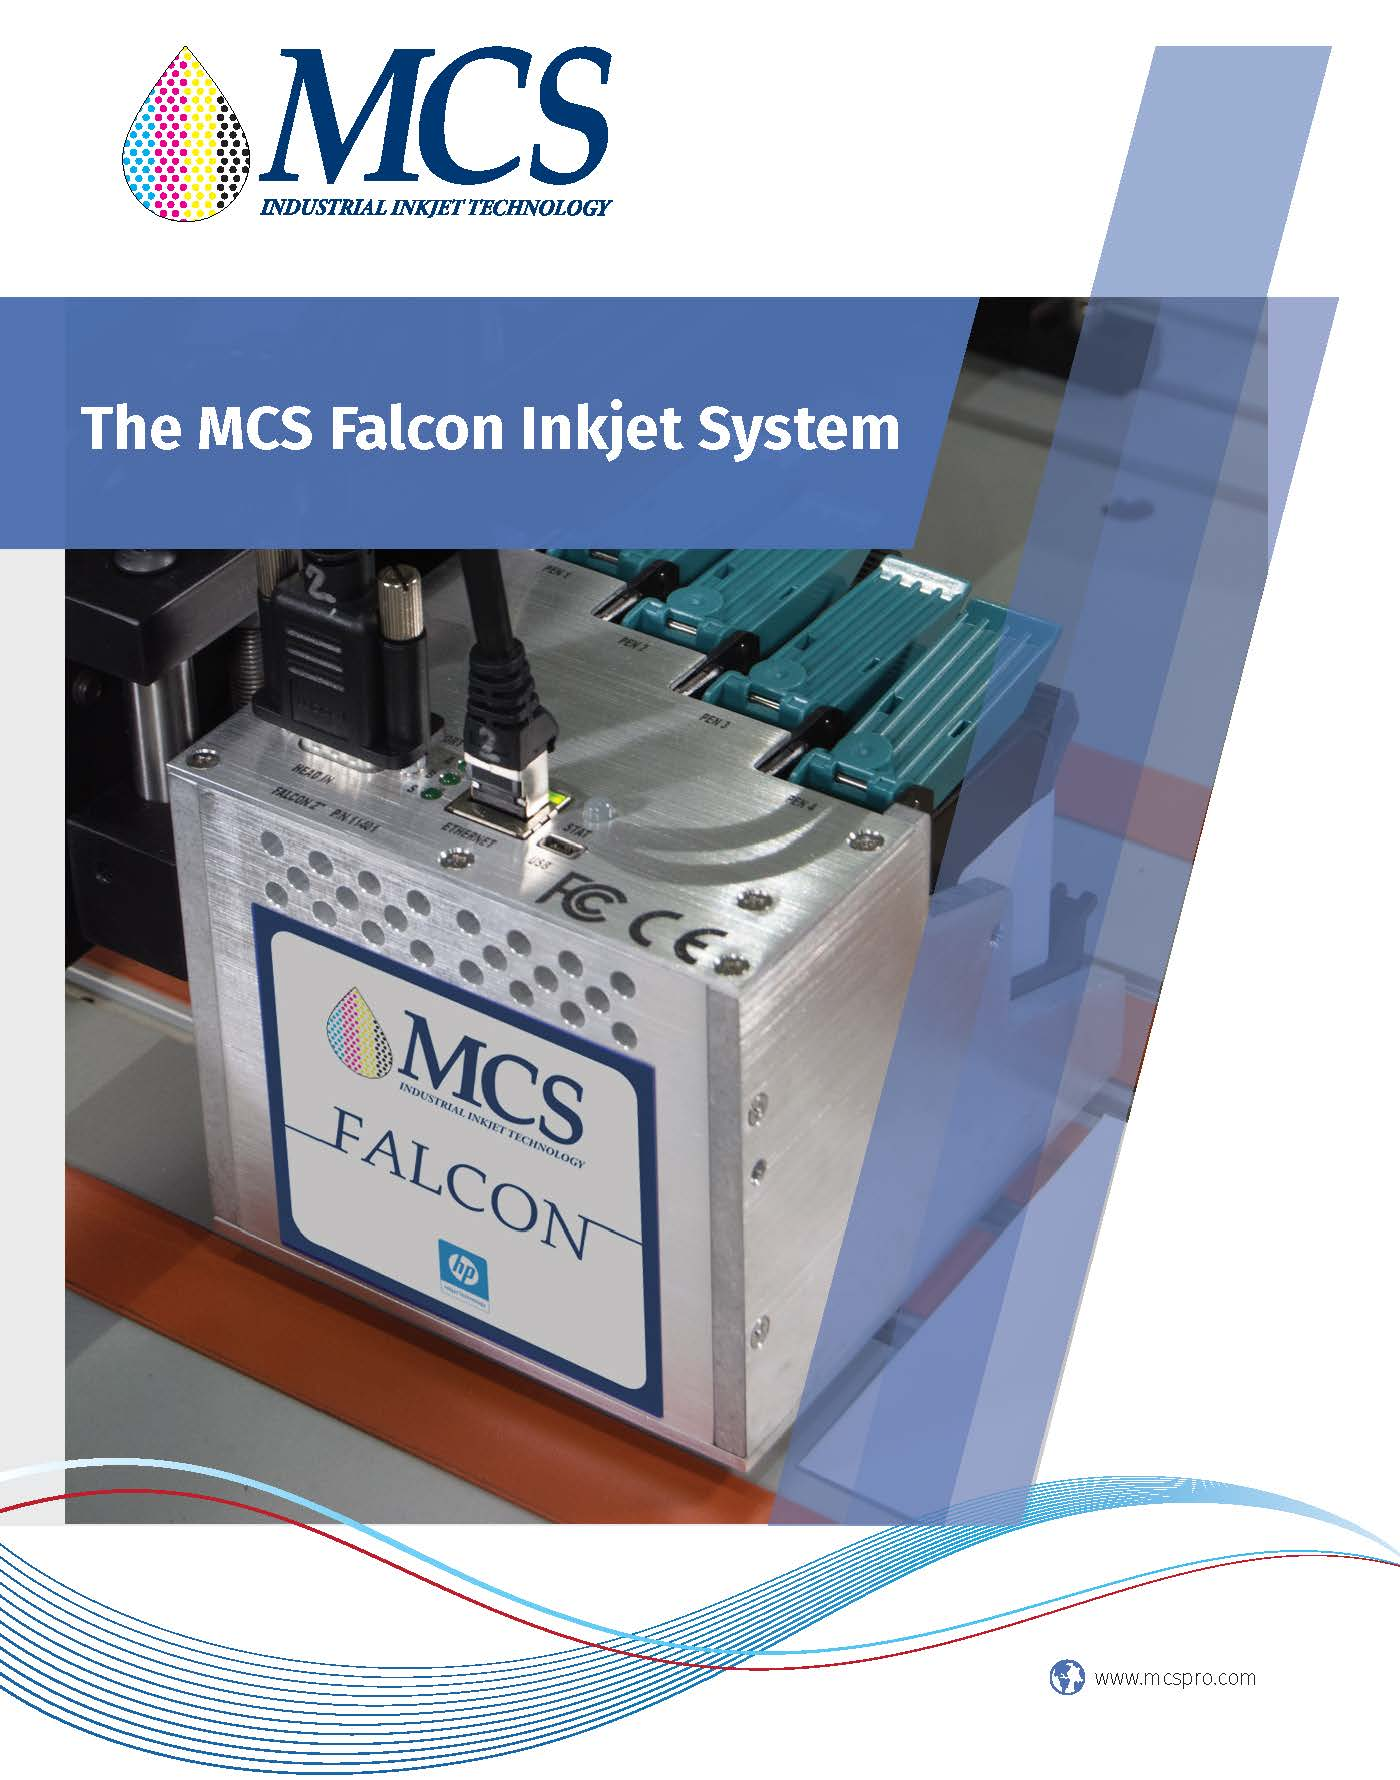 MCS FALCON INKJET SYSTEM